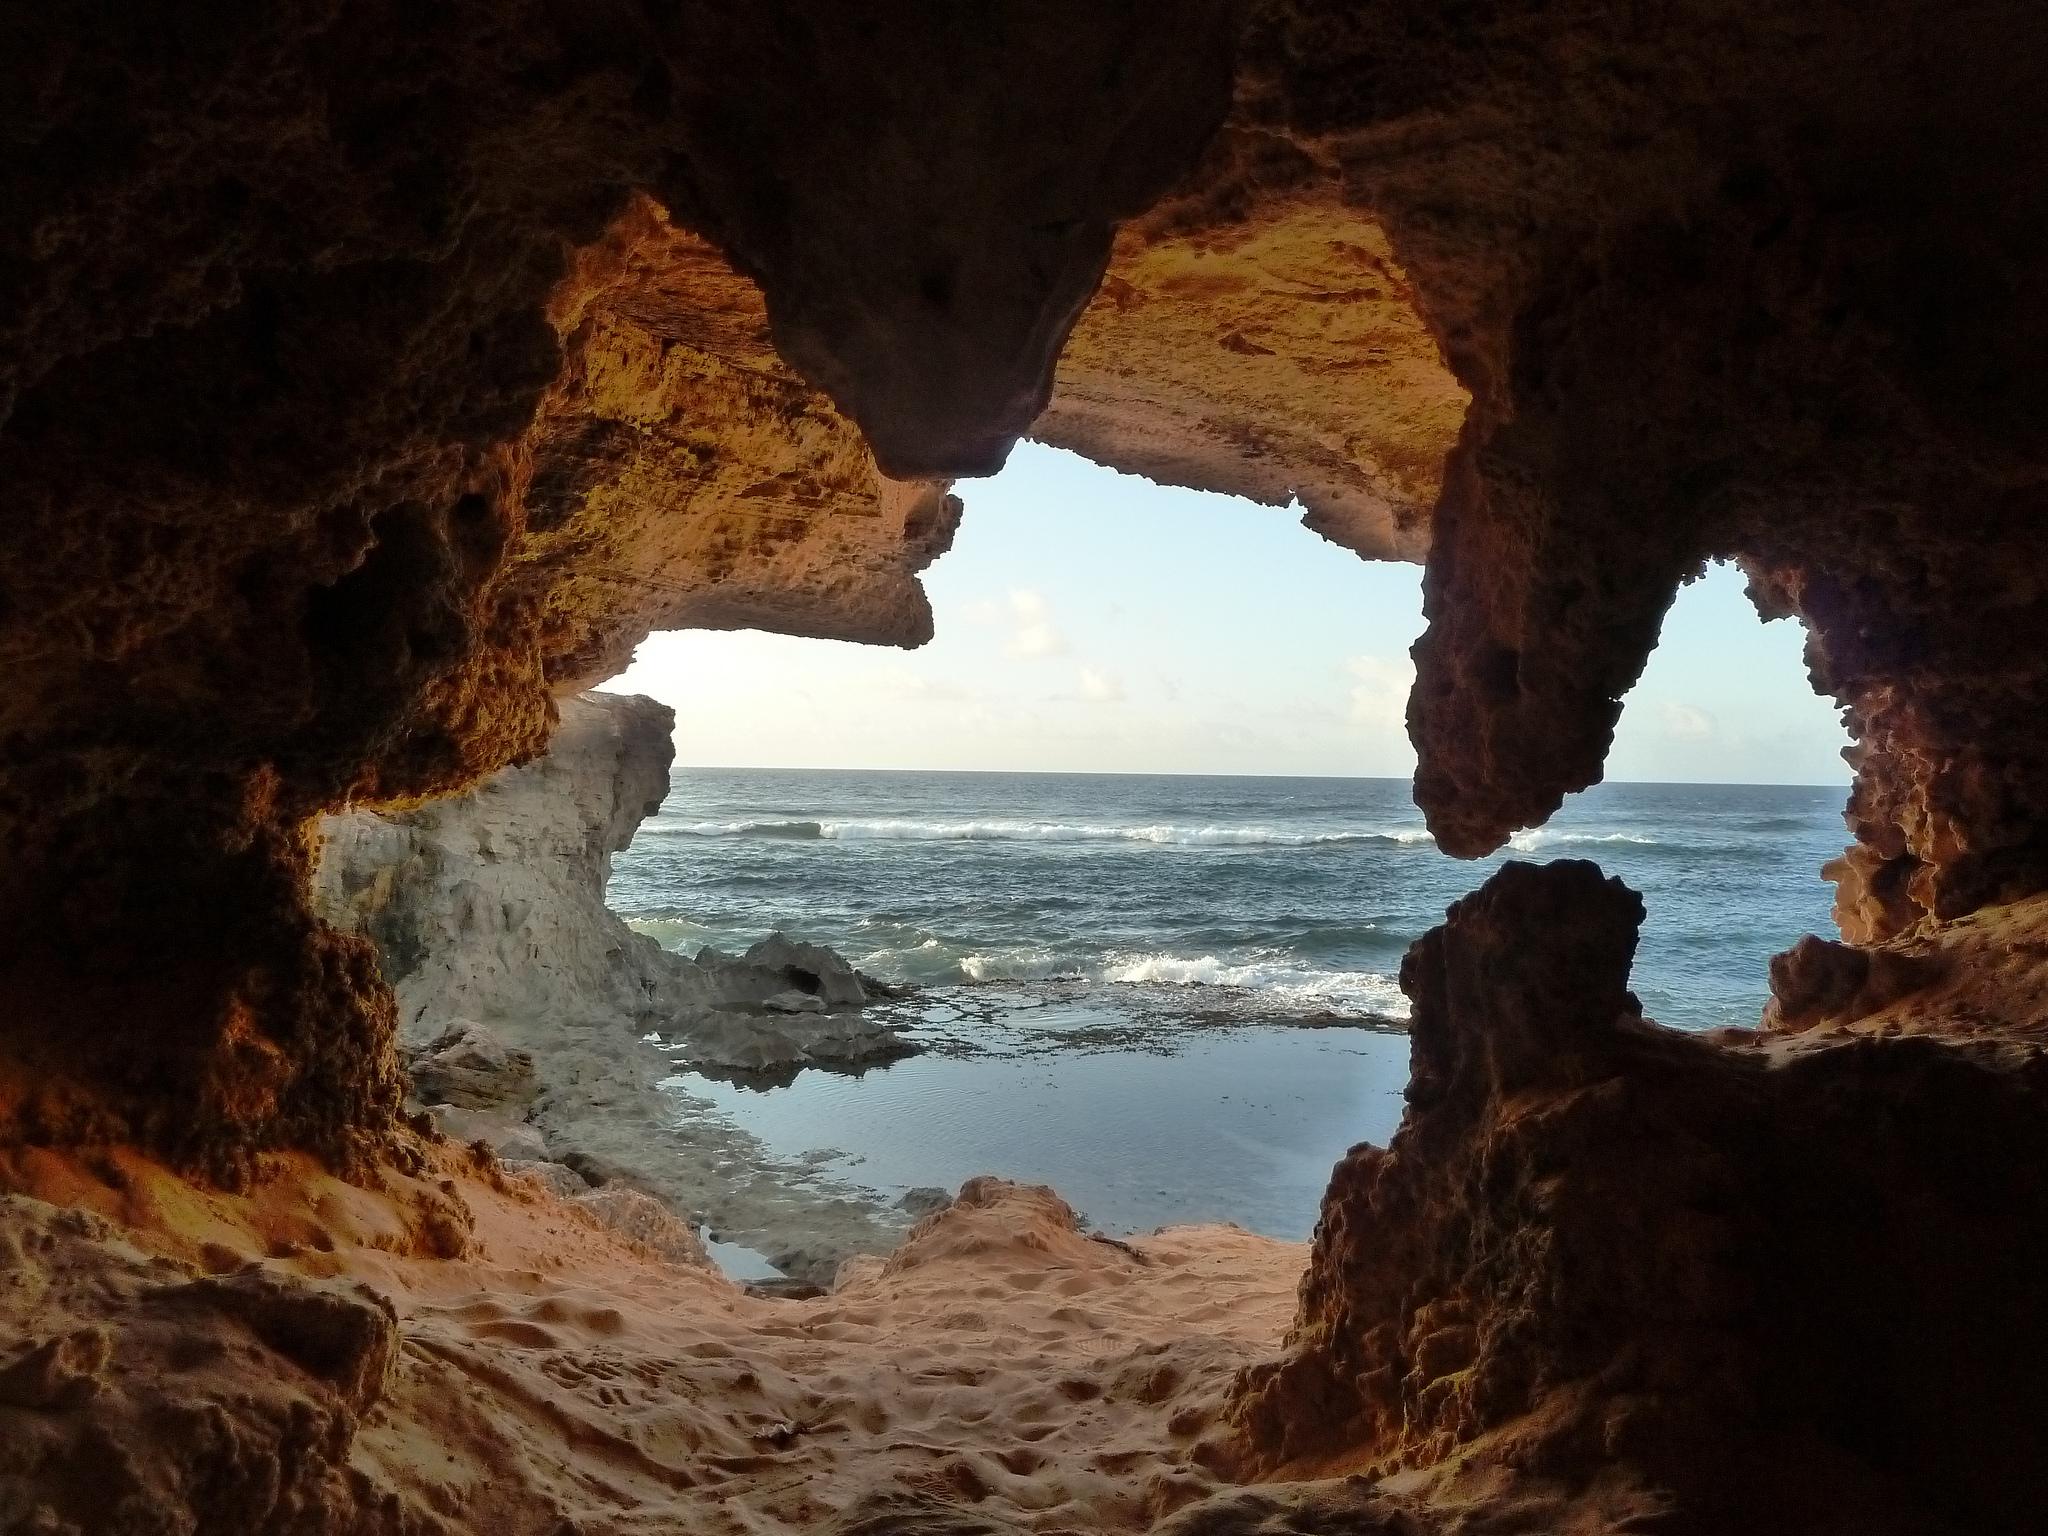 The Ultimate Sea Cave Kayak & Snorkel Tour - Javea Spain |Sea Cave